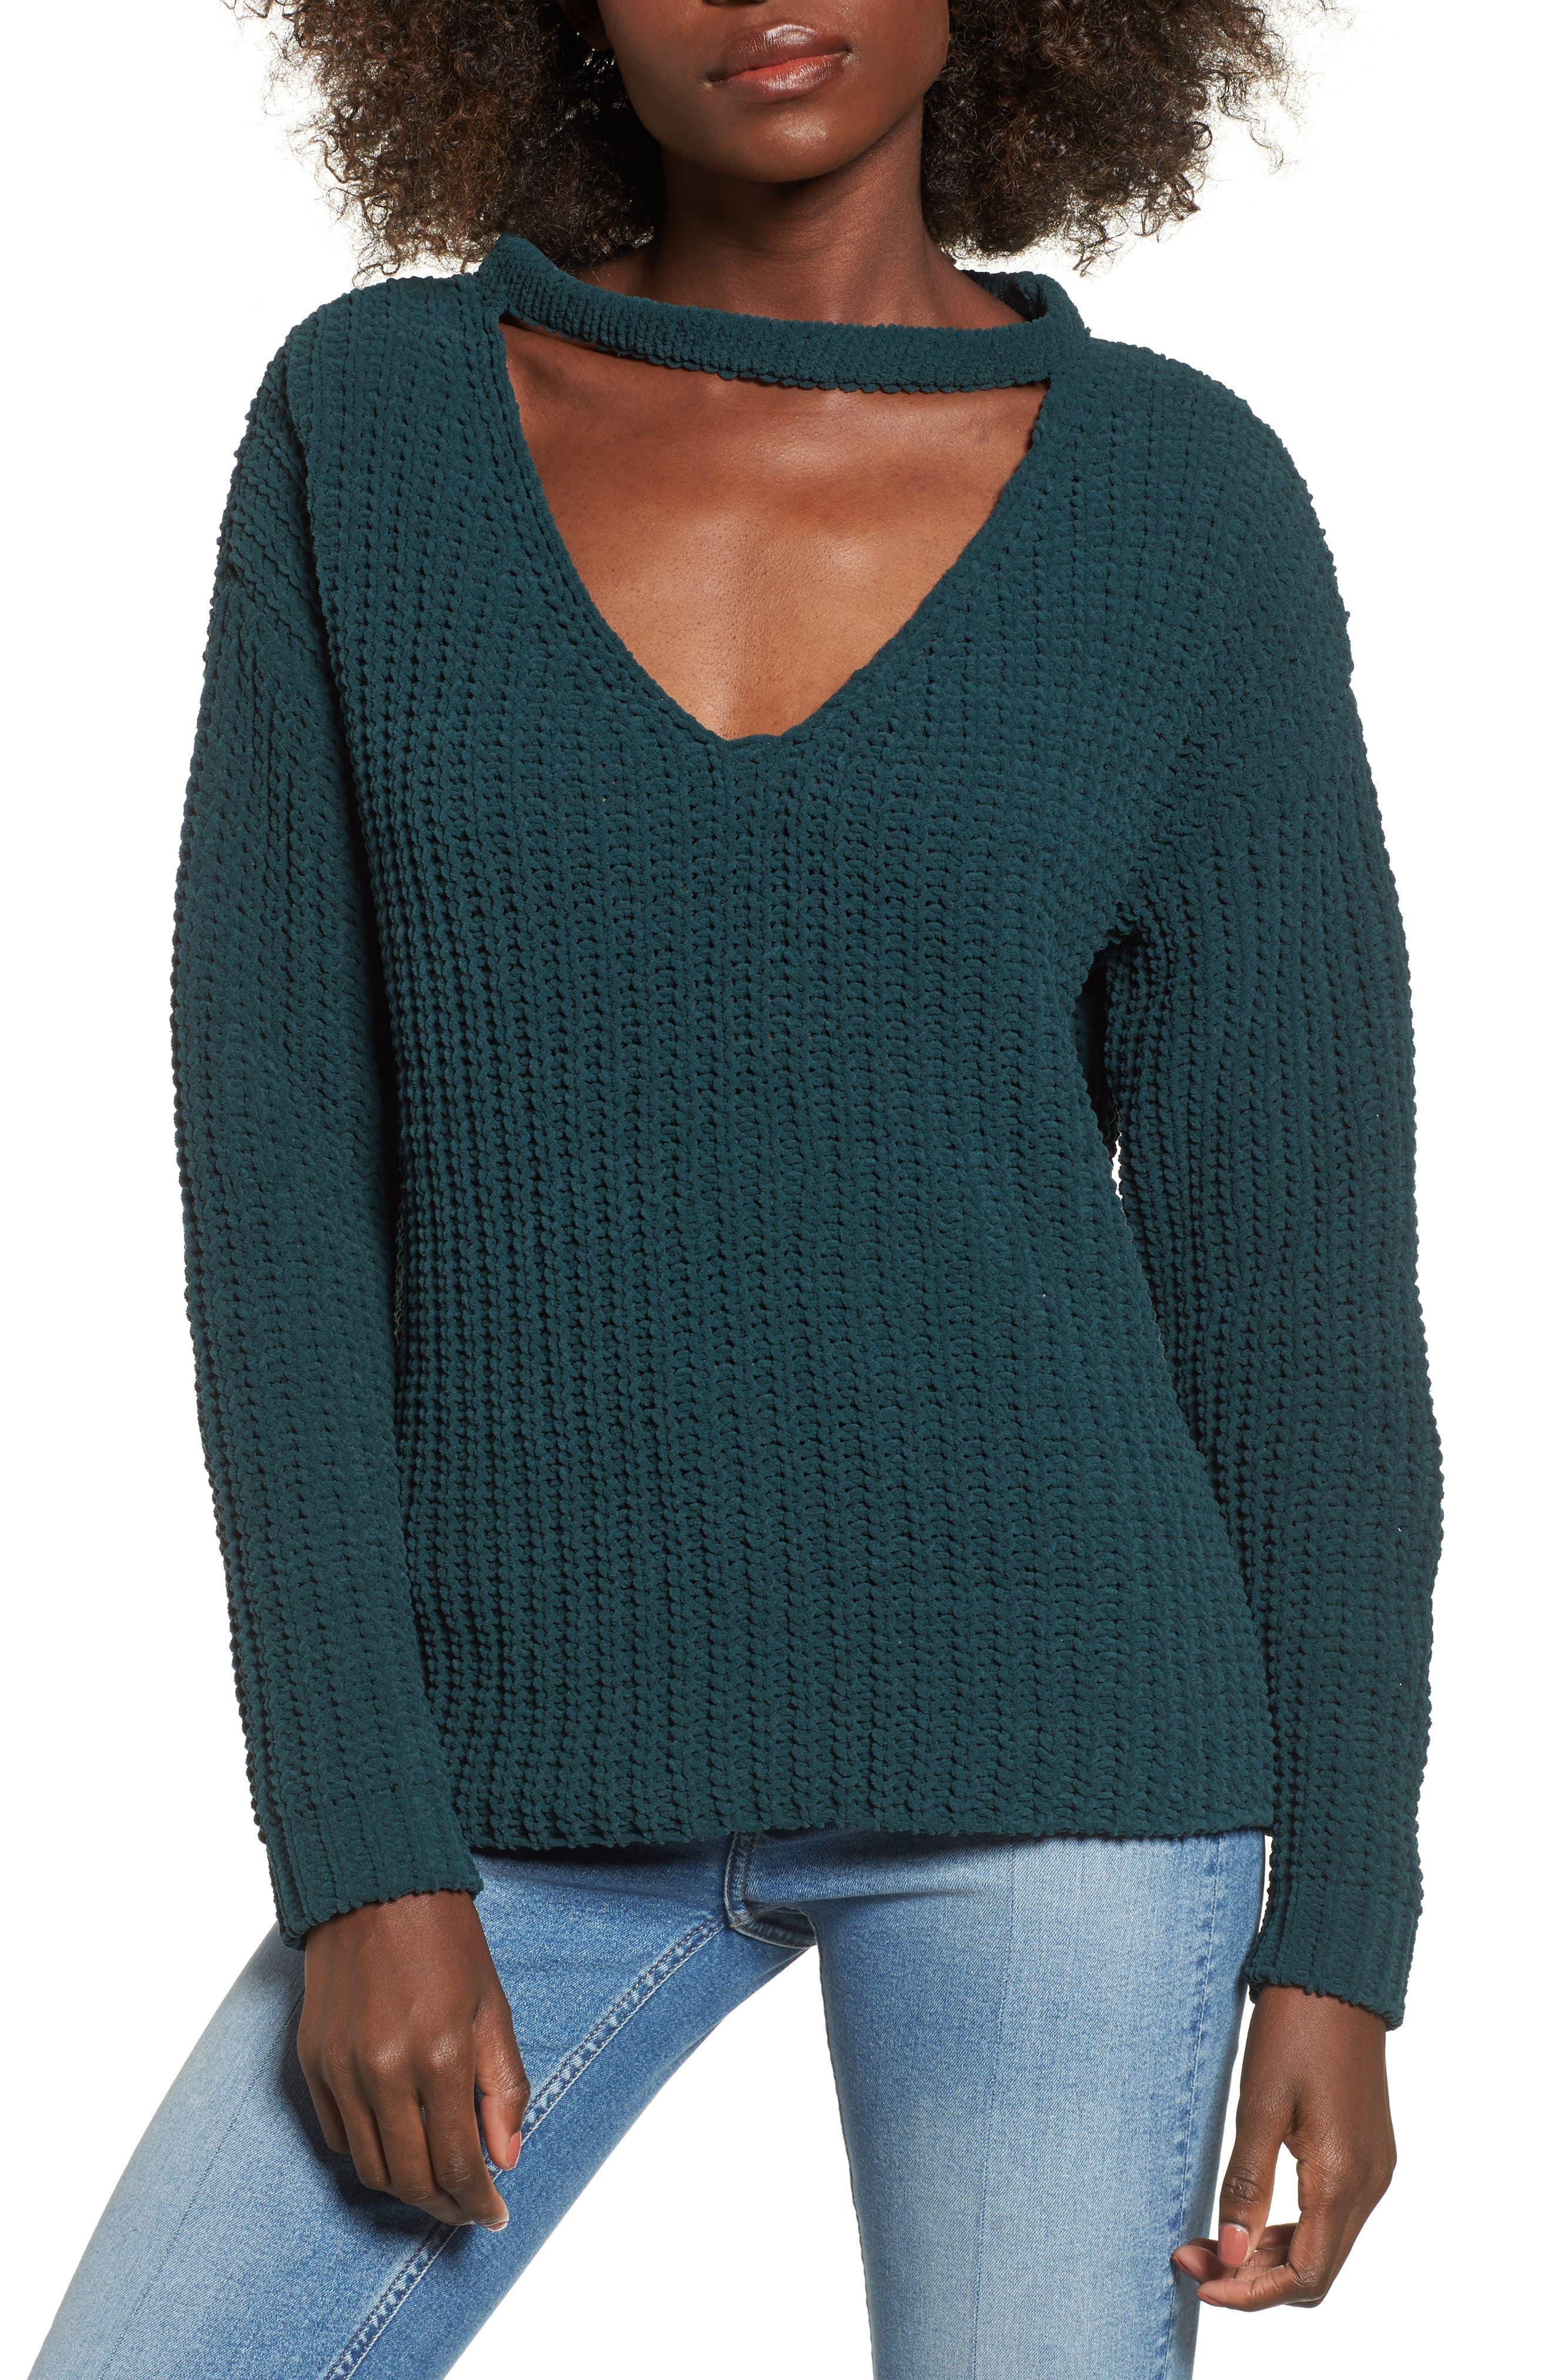 Mary Lous Choker Sweater,                         Main,                         color, 300